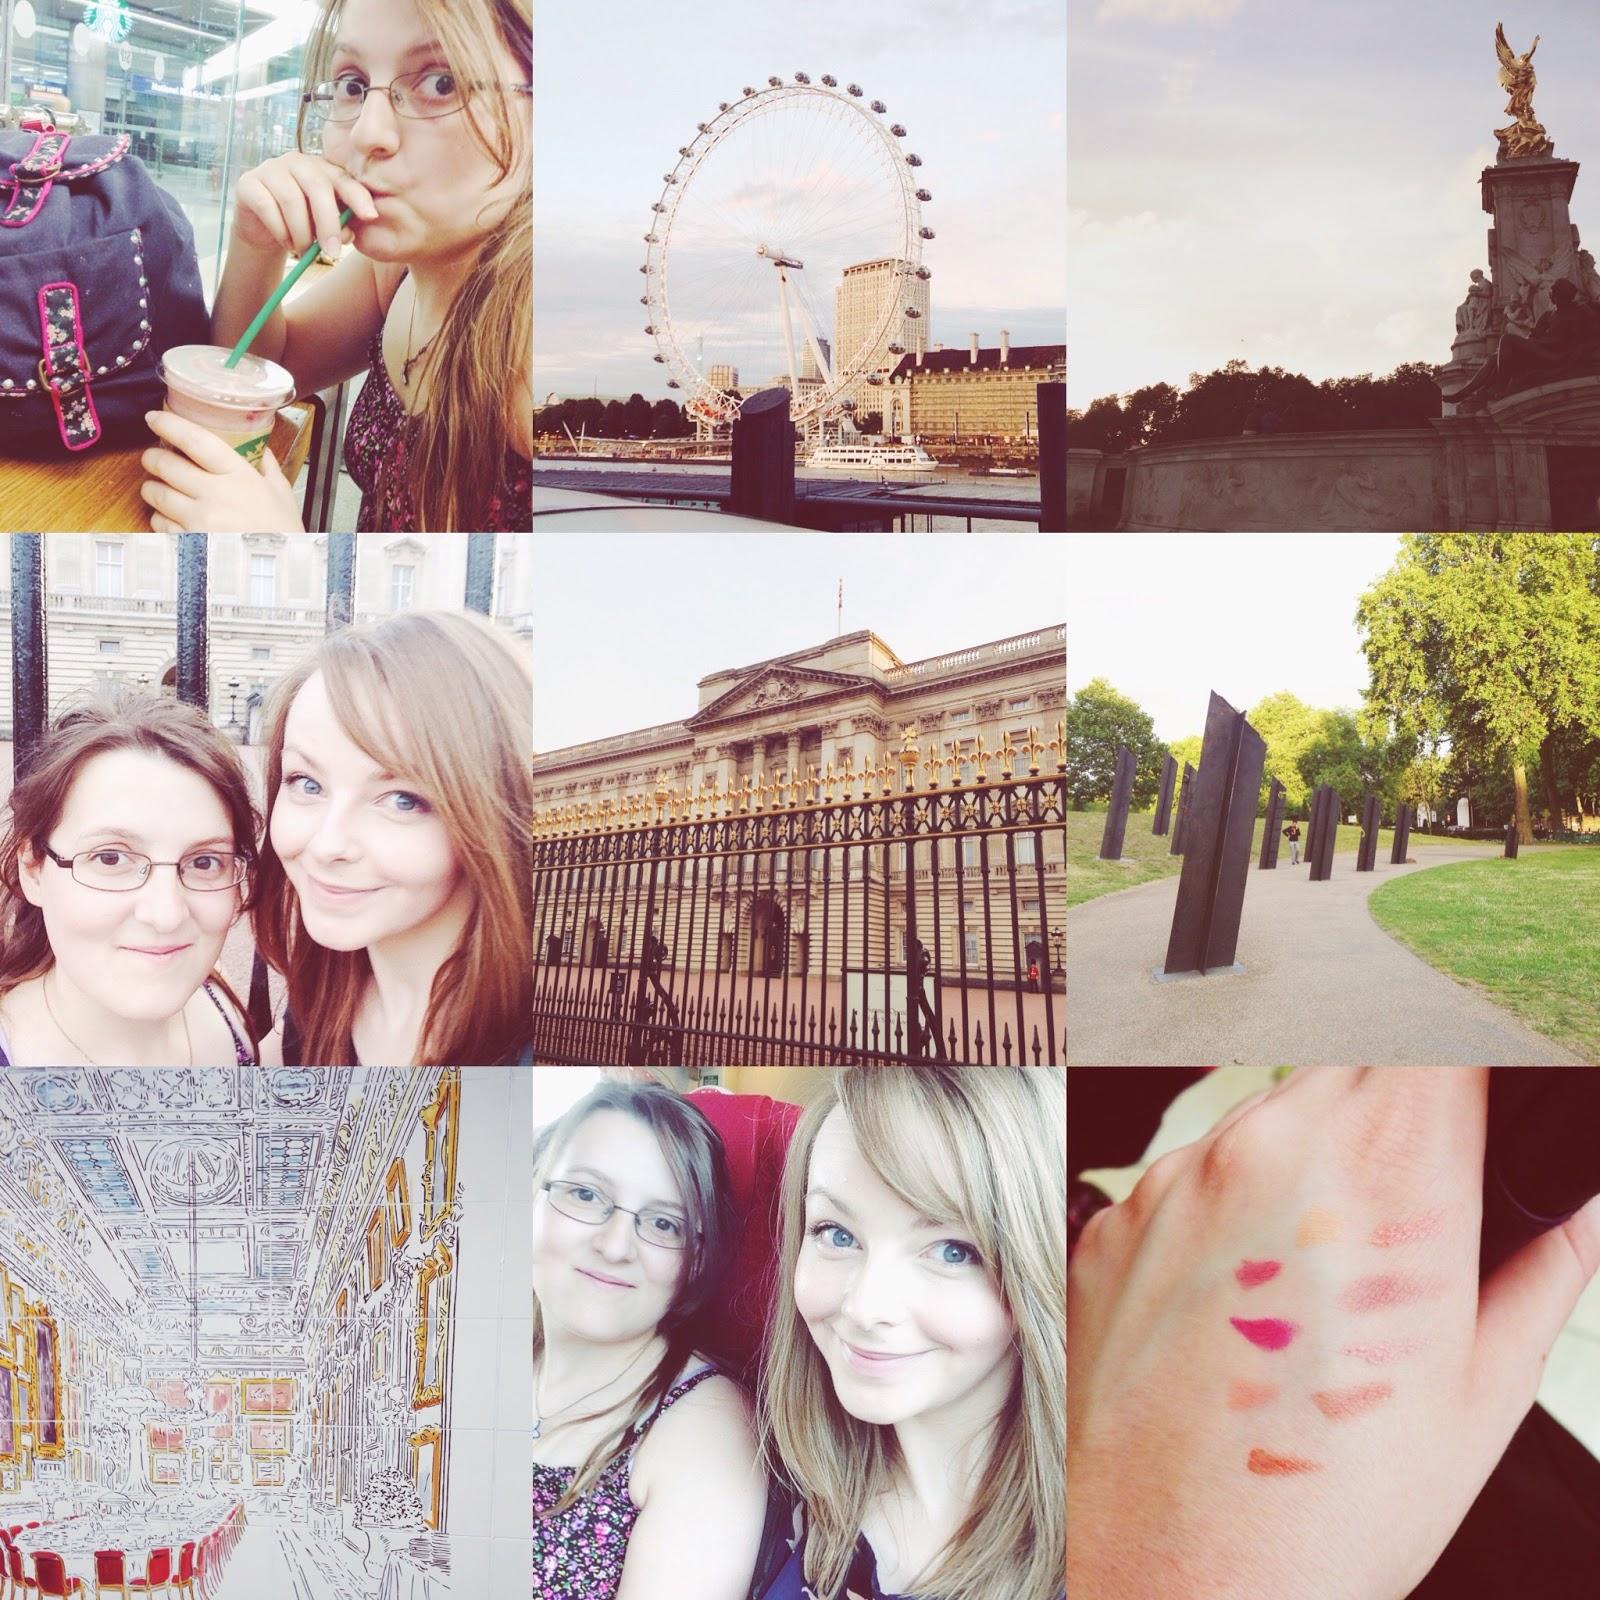 Instagram, Montage, London